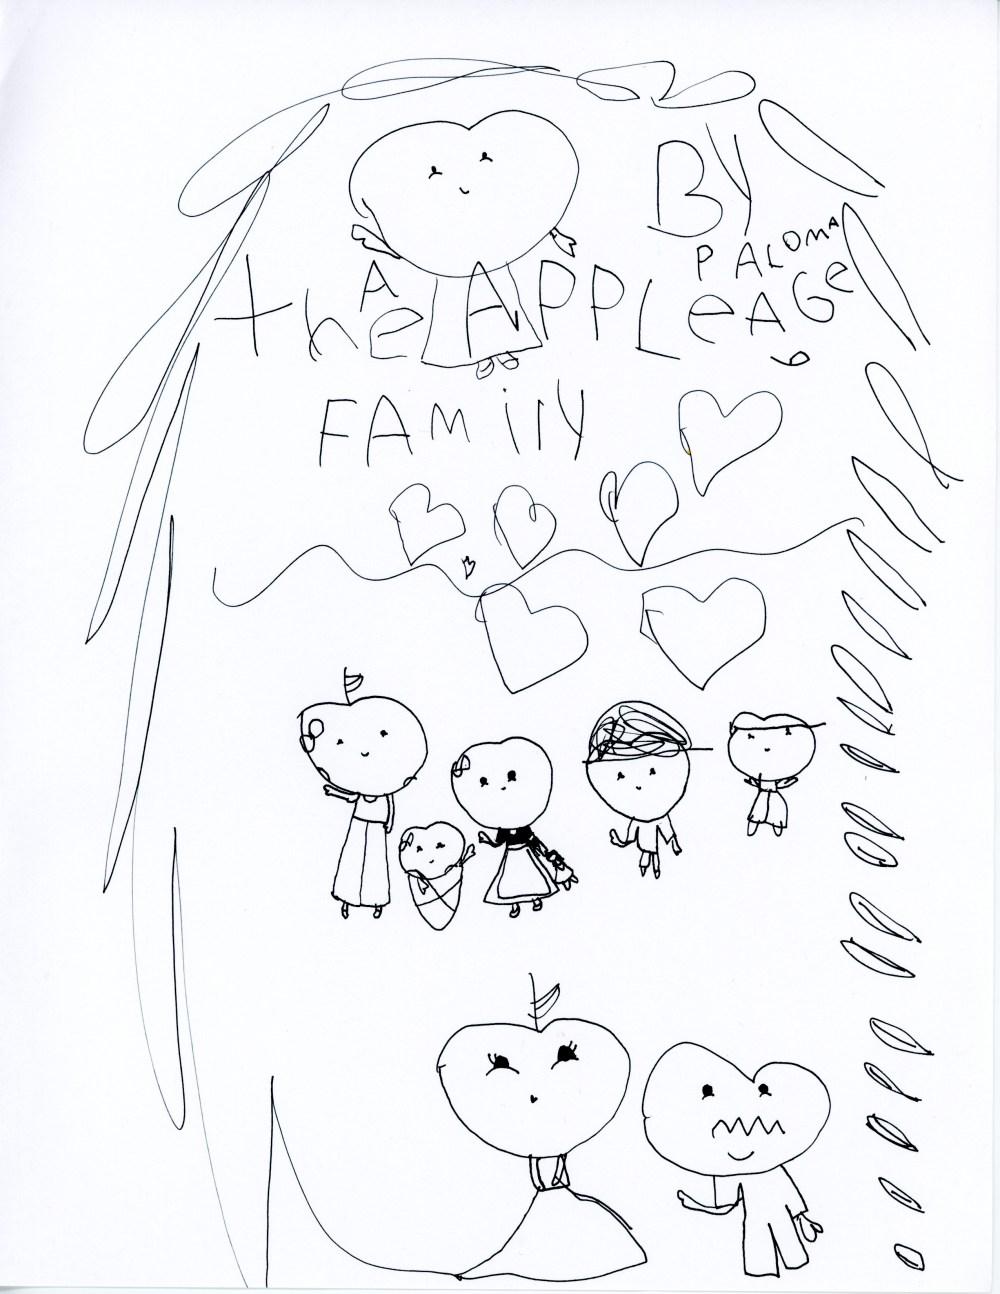 Apple Family by Paloma jpg